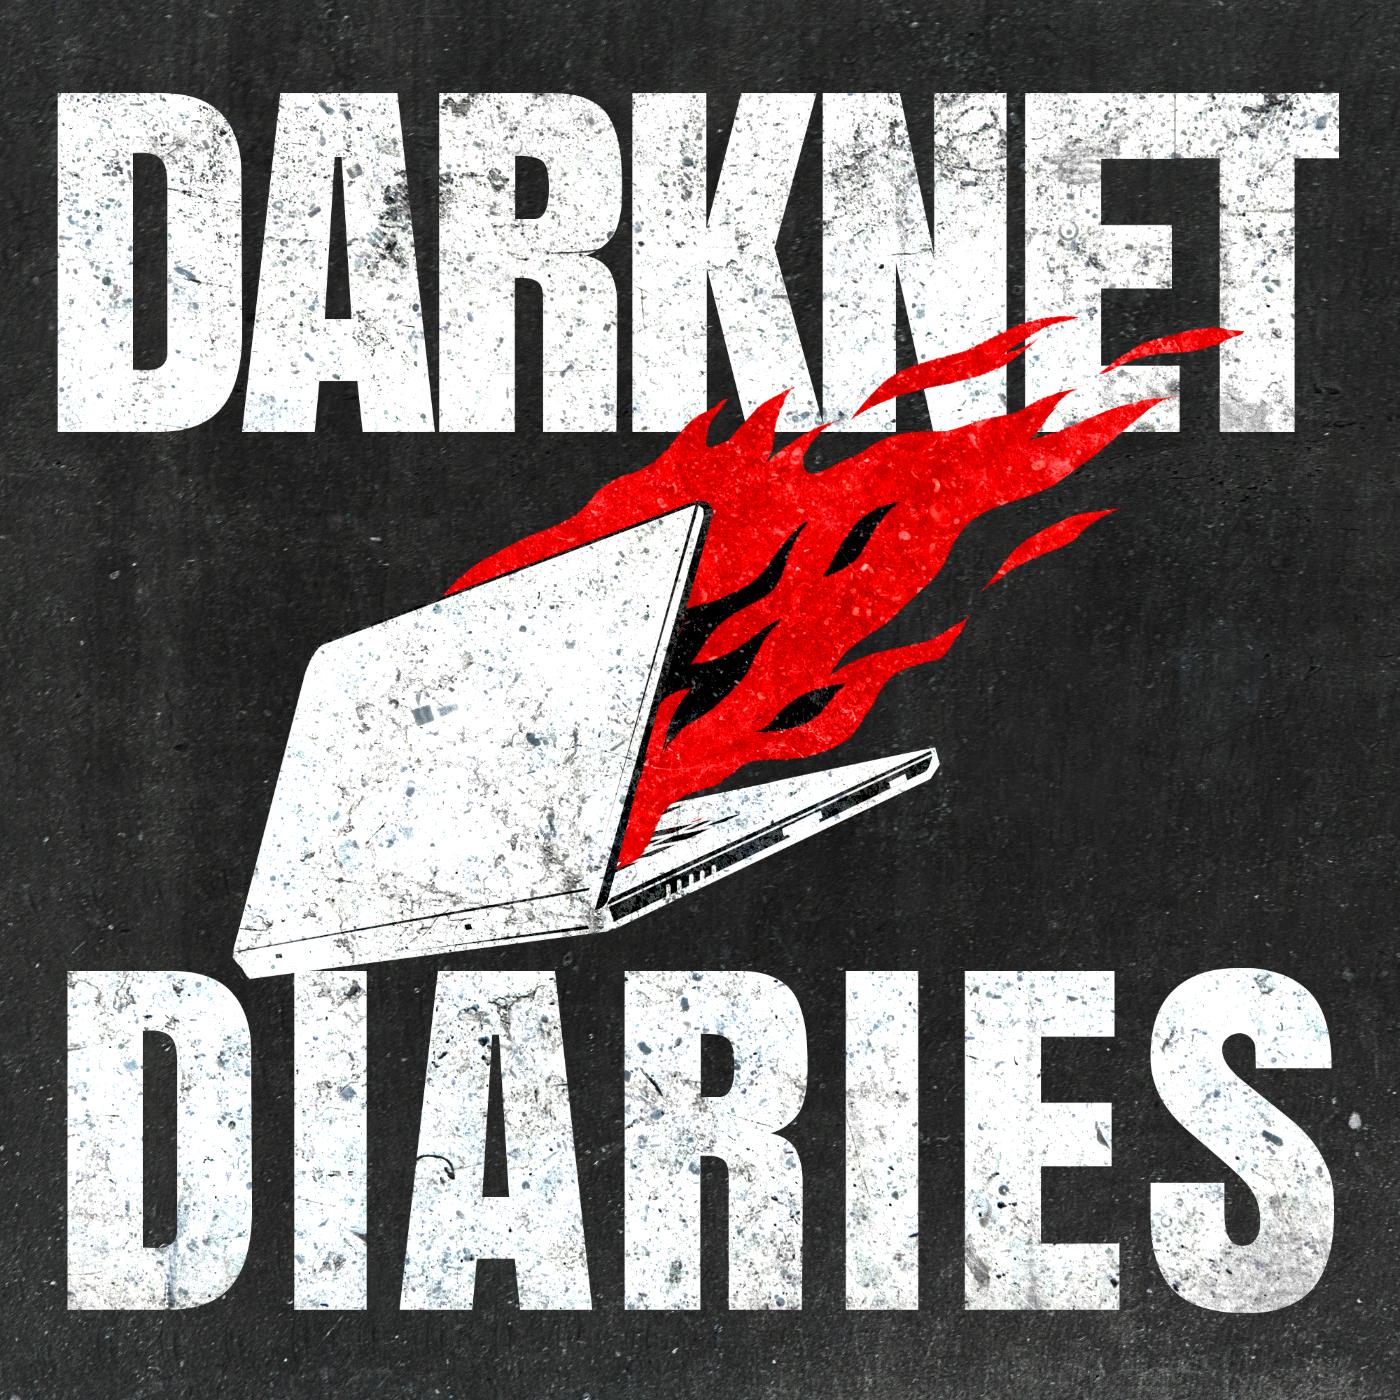 61. Darknet Diaries